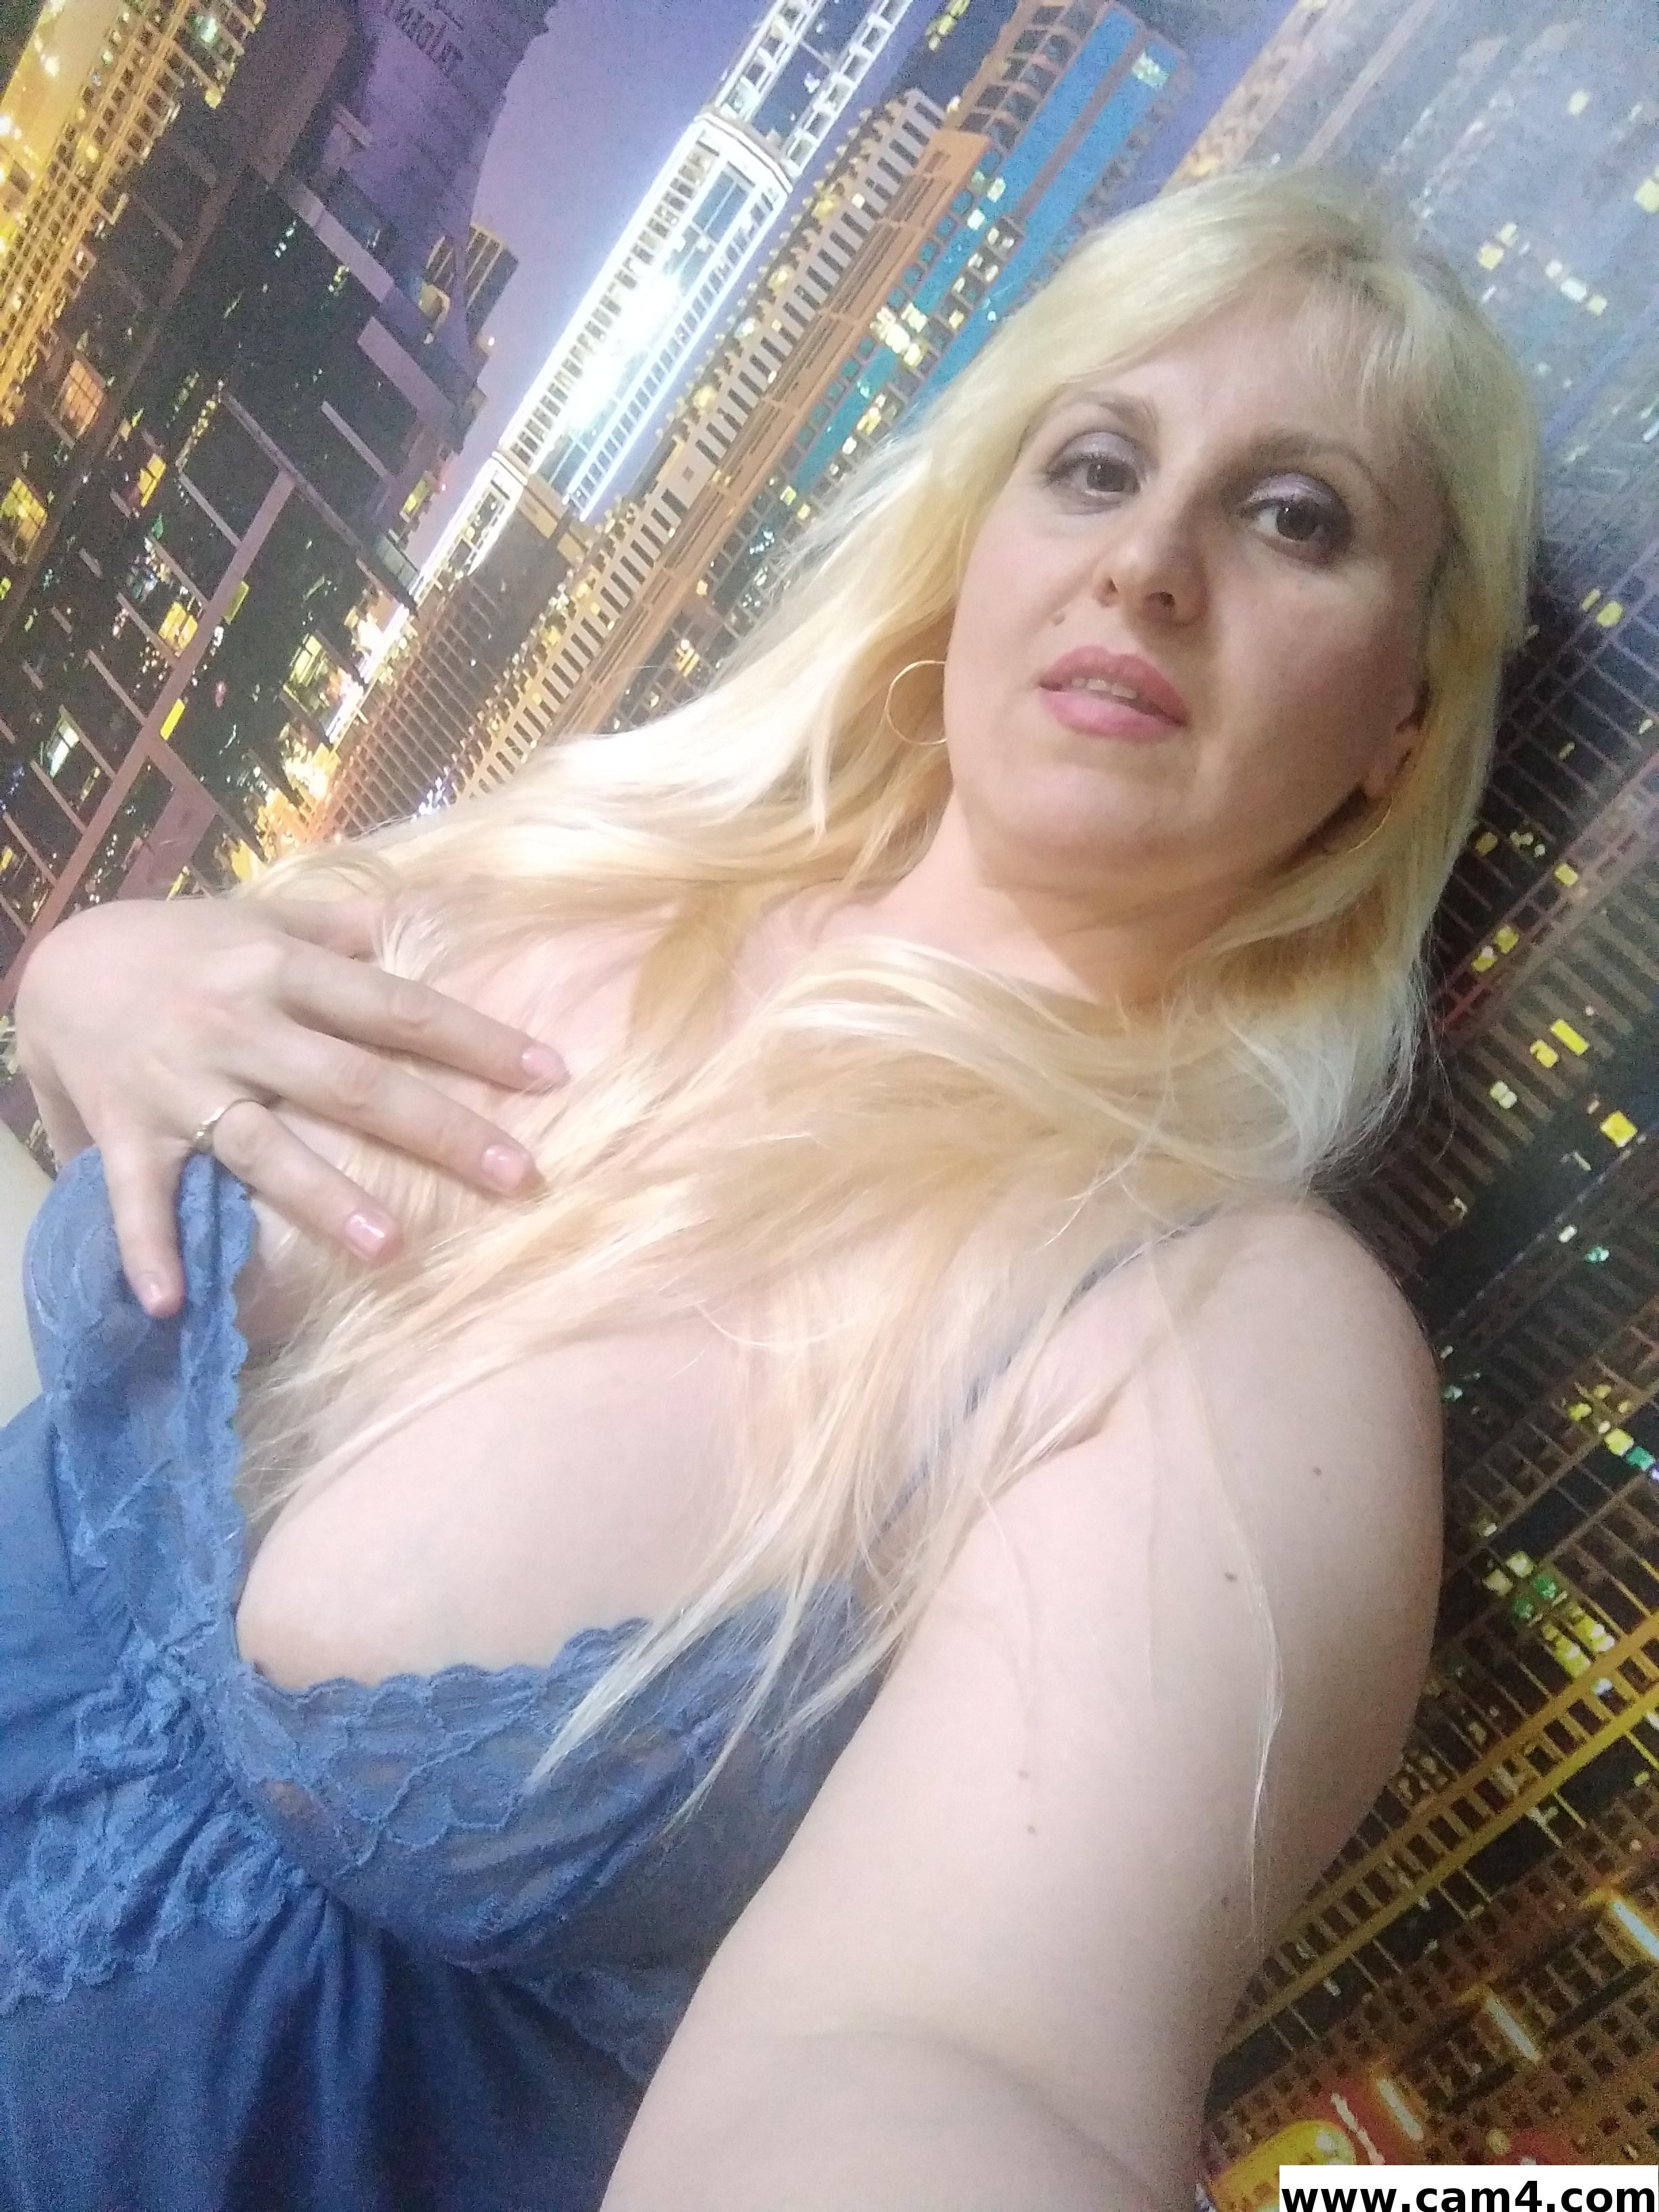 Blondabella?s=ptfcpvx4fnoklkc6velvuuejevsbnxbjxaibcqadq+u=